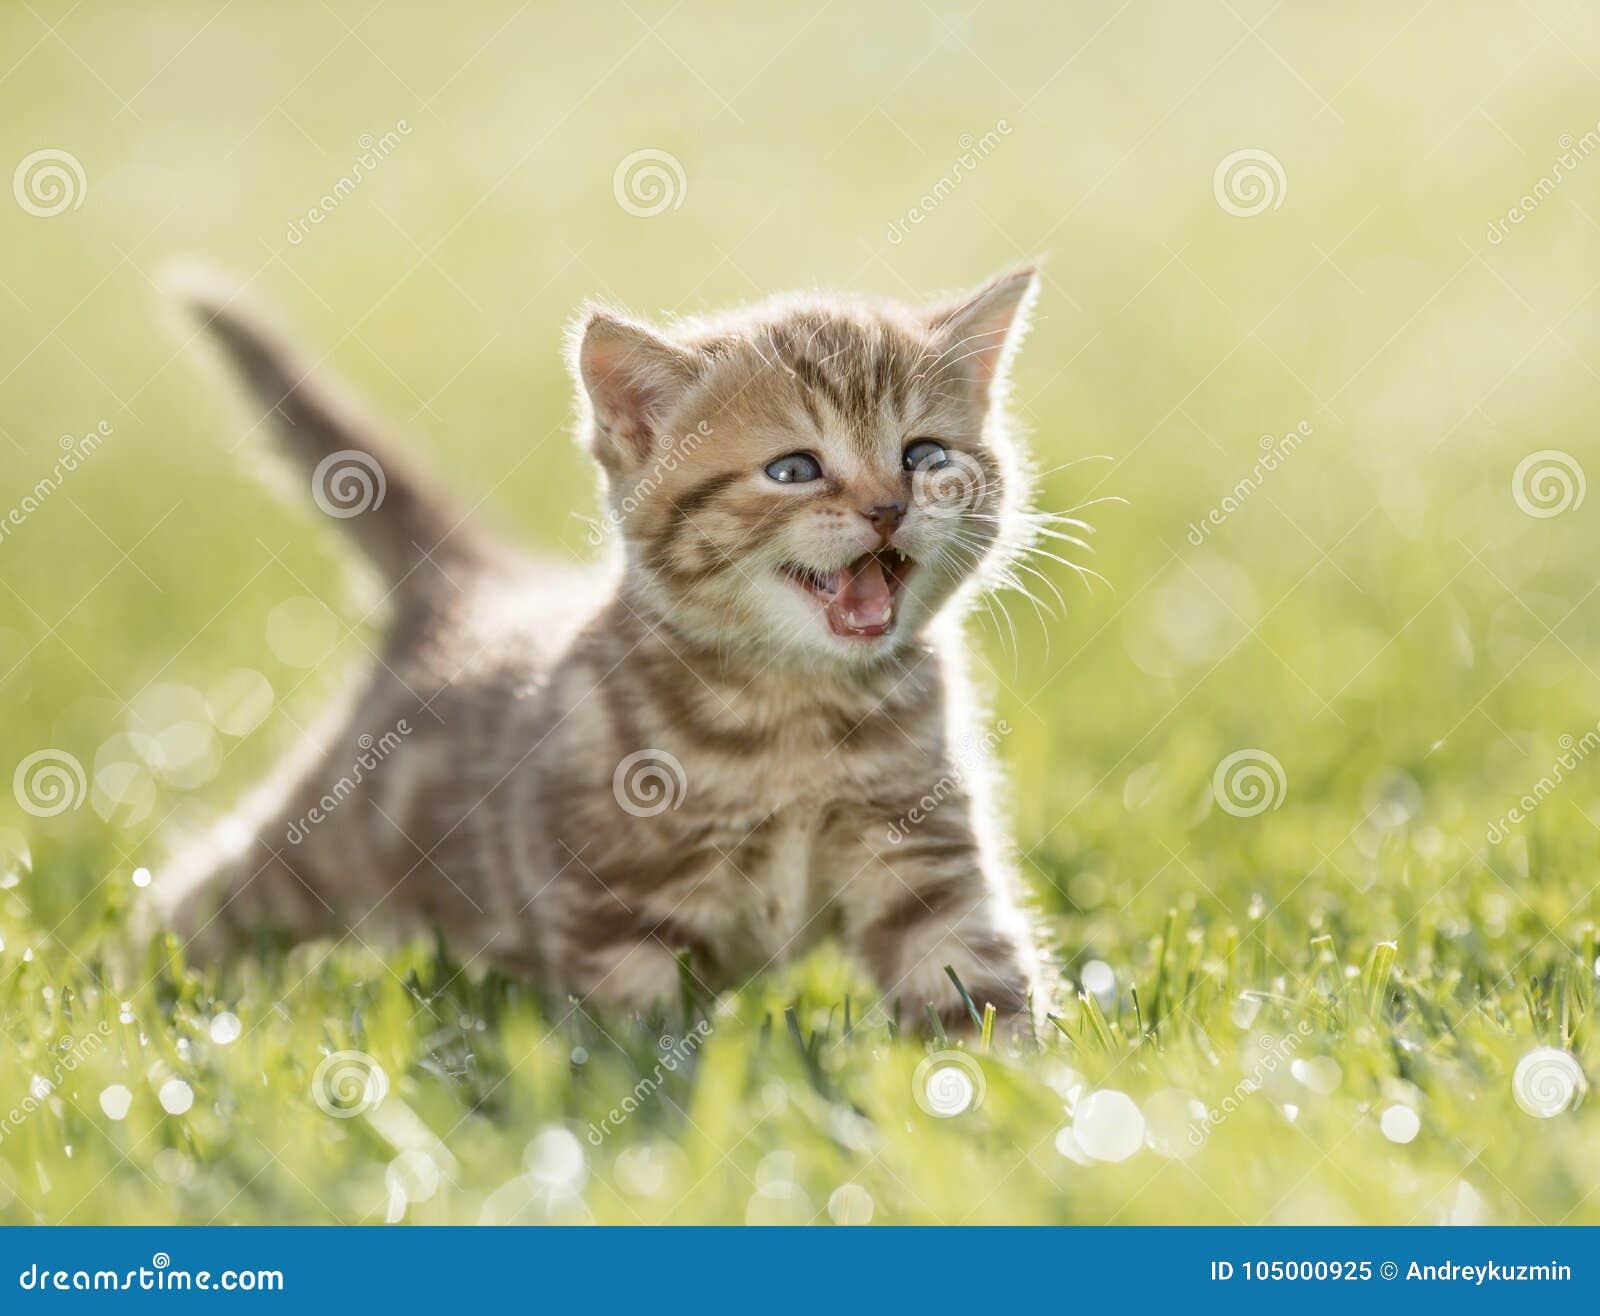 Katje die in het groene gras mauwen